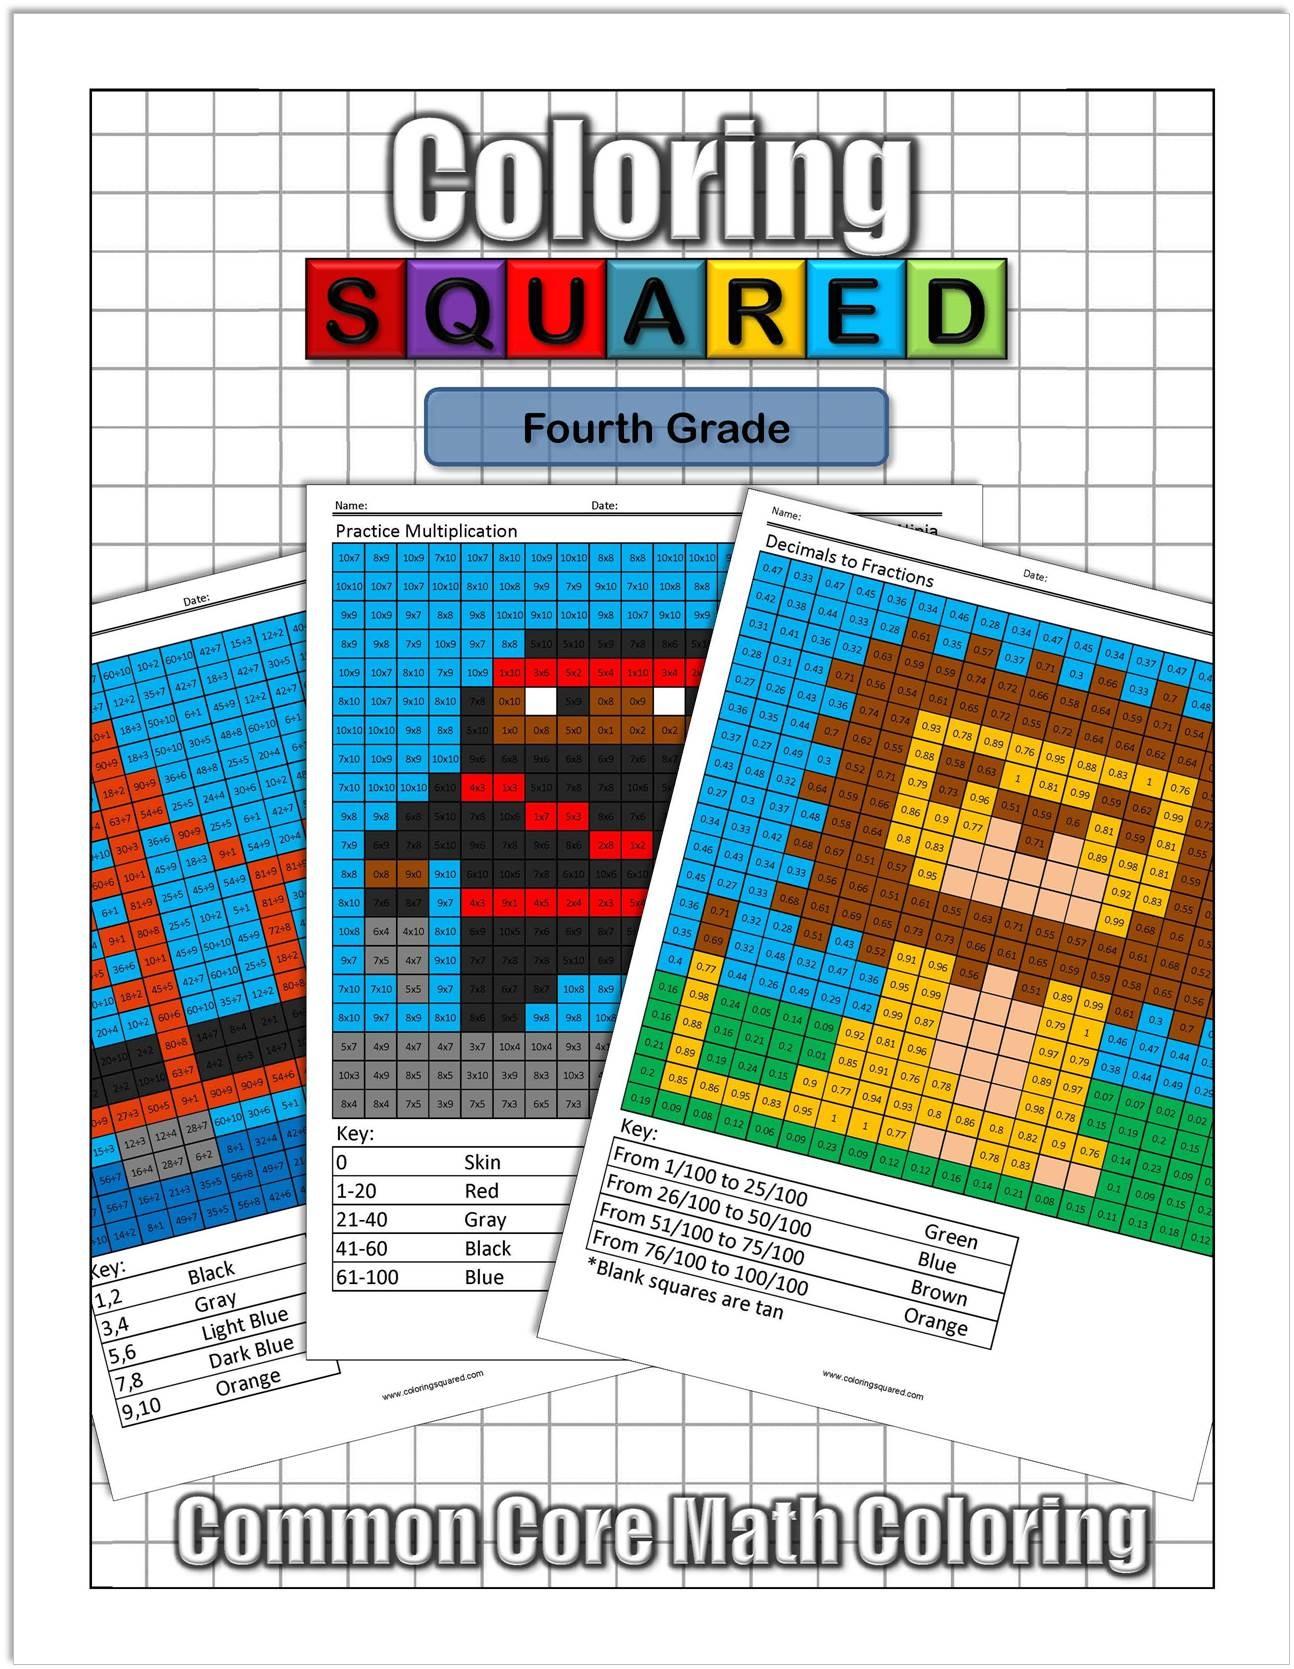 4Th Grade Math - Coloring Squared - Free Printable Fun Math Worksheets For 4Th Grade